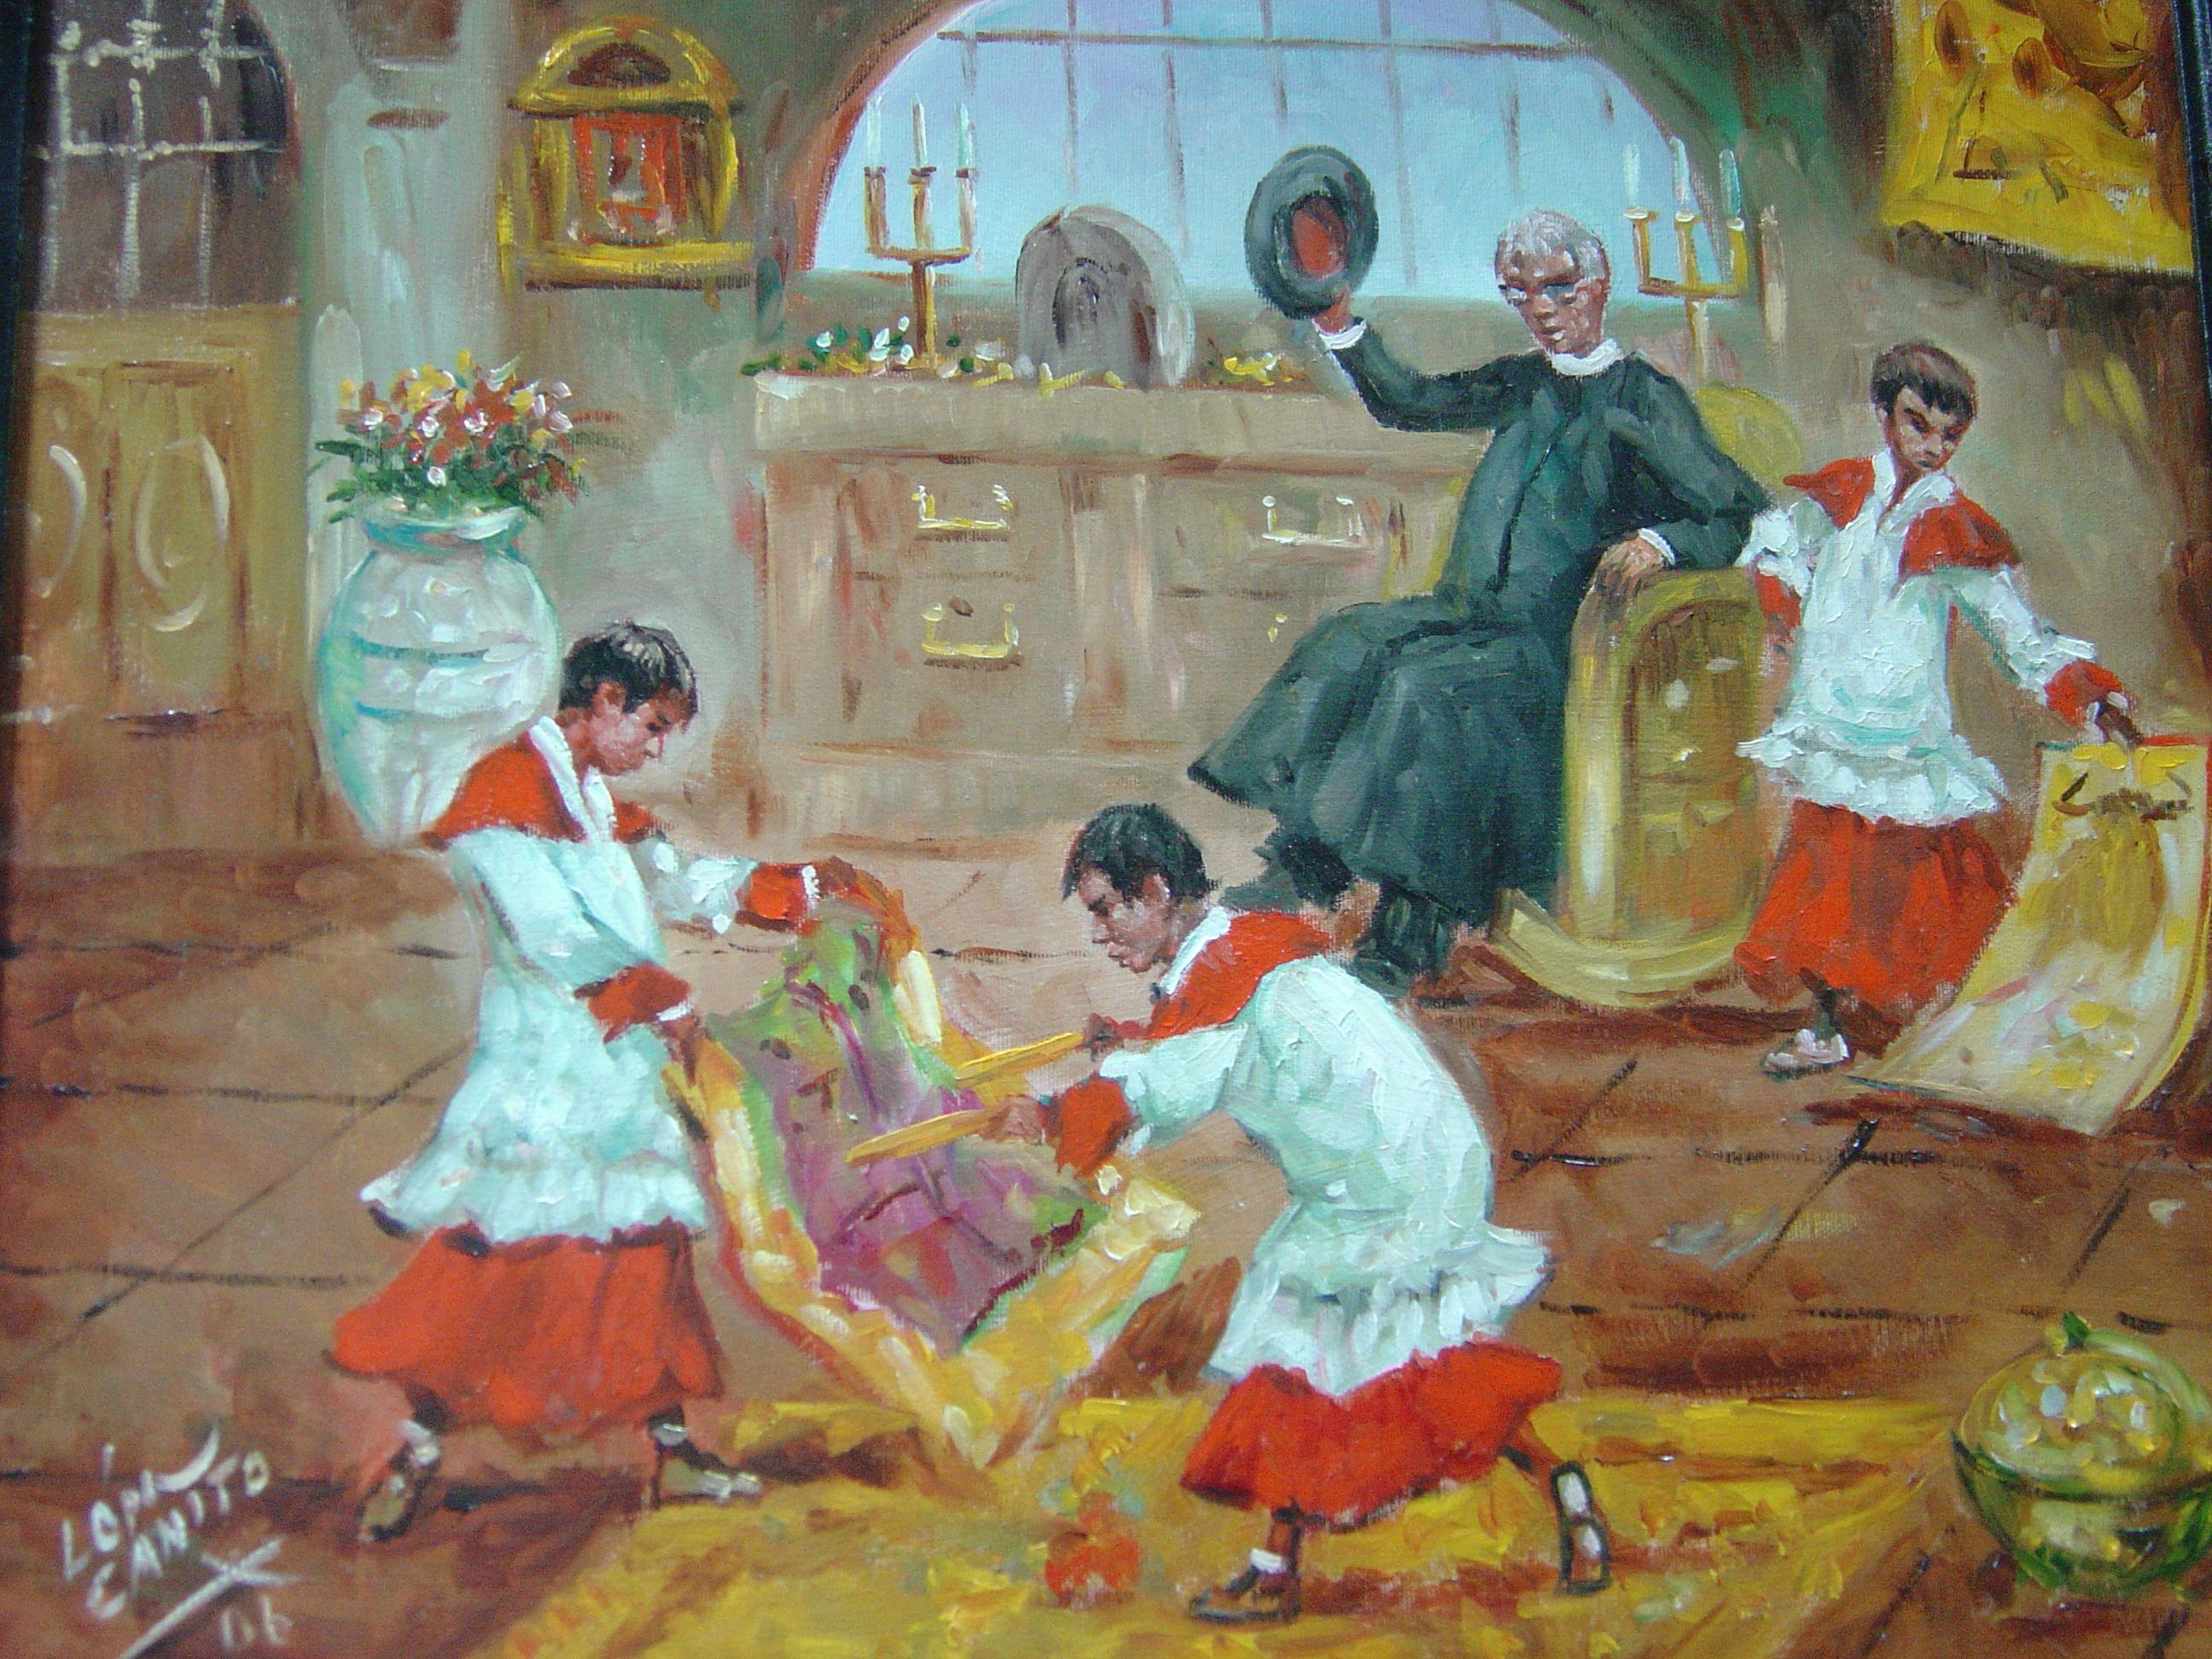 Galerista alicantino compra venta de obras de arte - Galerista de arte ...